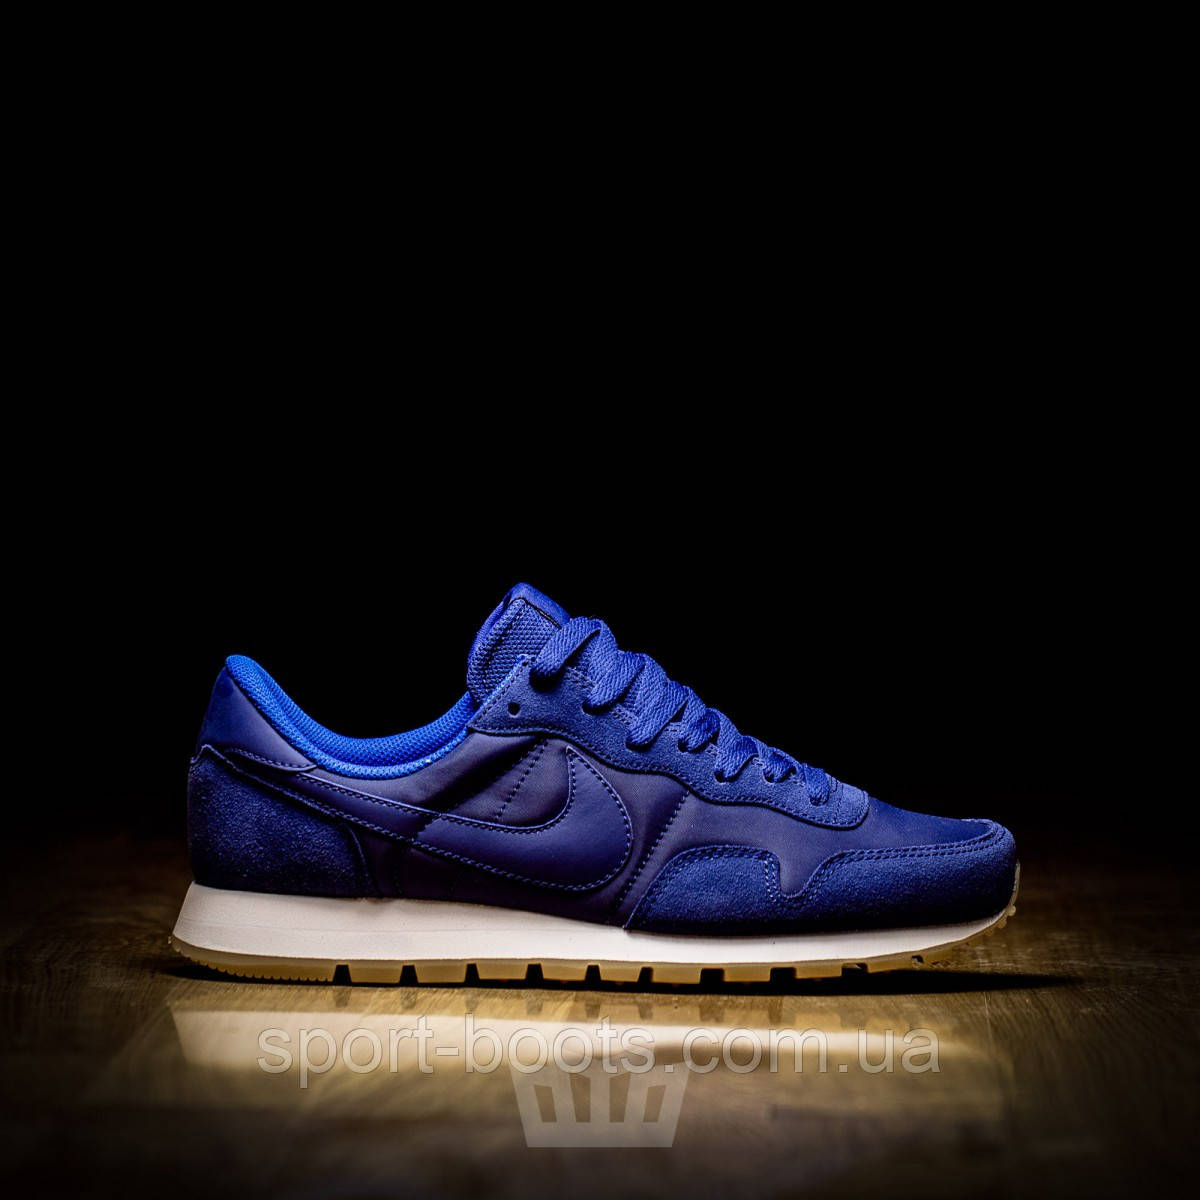 best sneakers 09a9f 9fb48 Оригинальные мужские кроссовки NIKE AIR PEGASUS 83 DEEP ROYAL